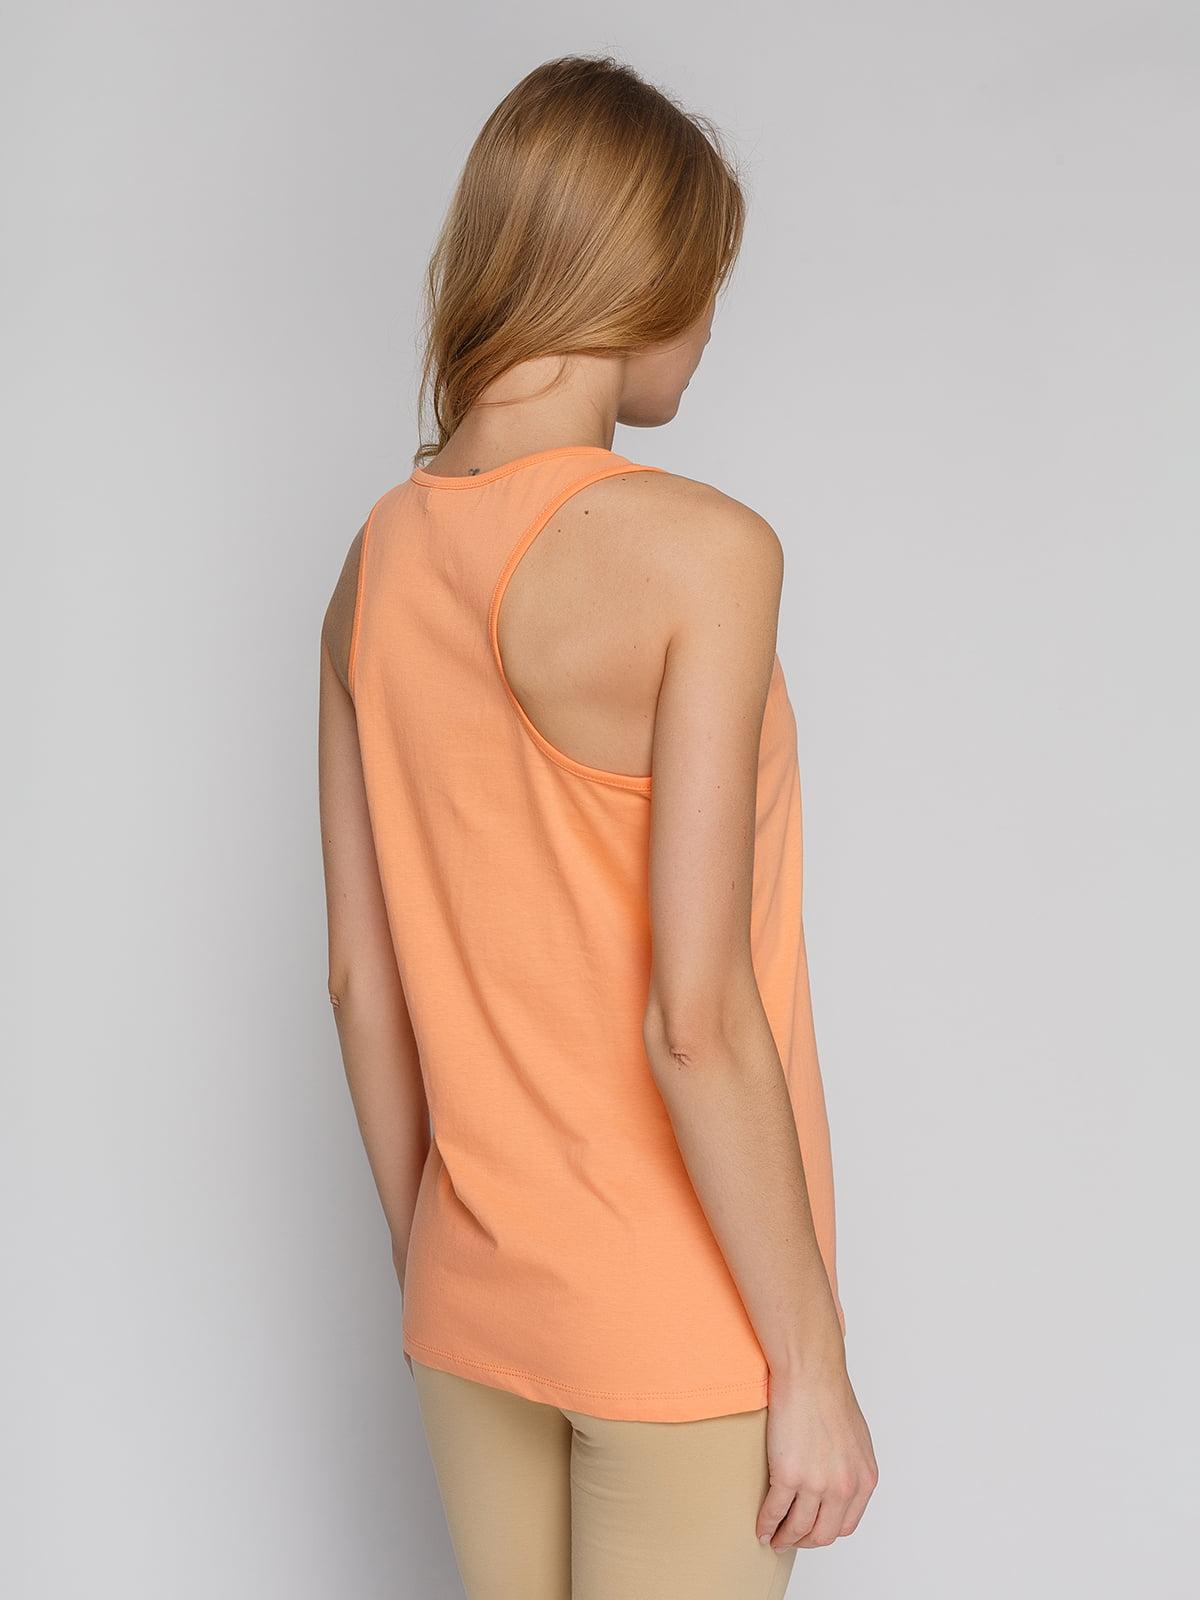 Майка помаранчева з принтом | 4855112 | фото 2